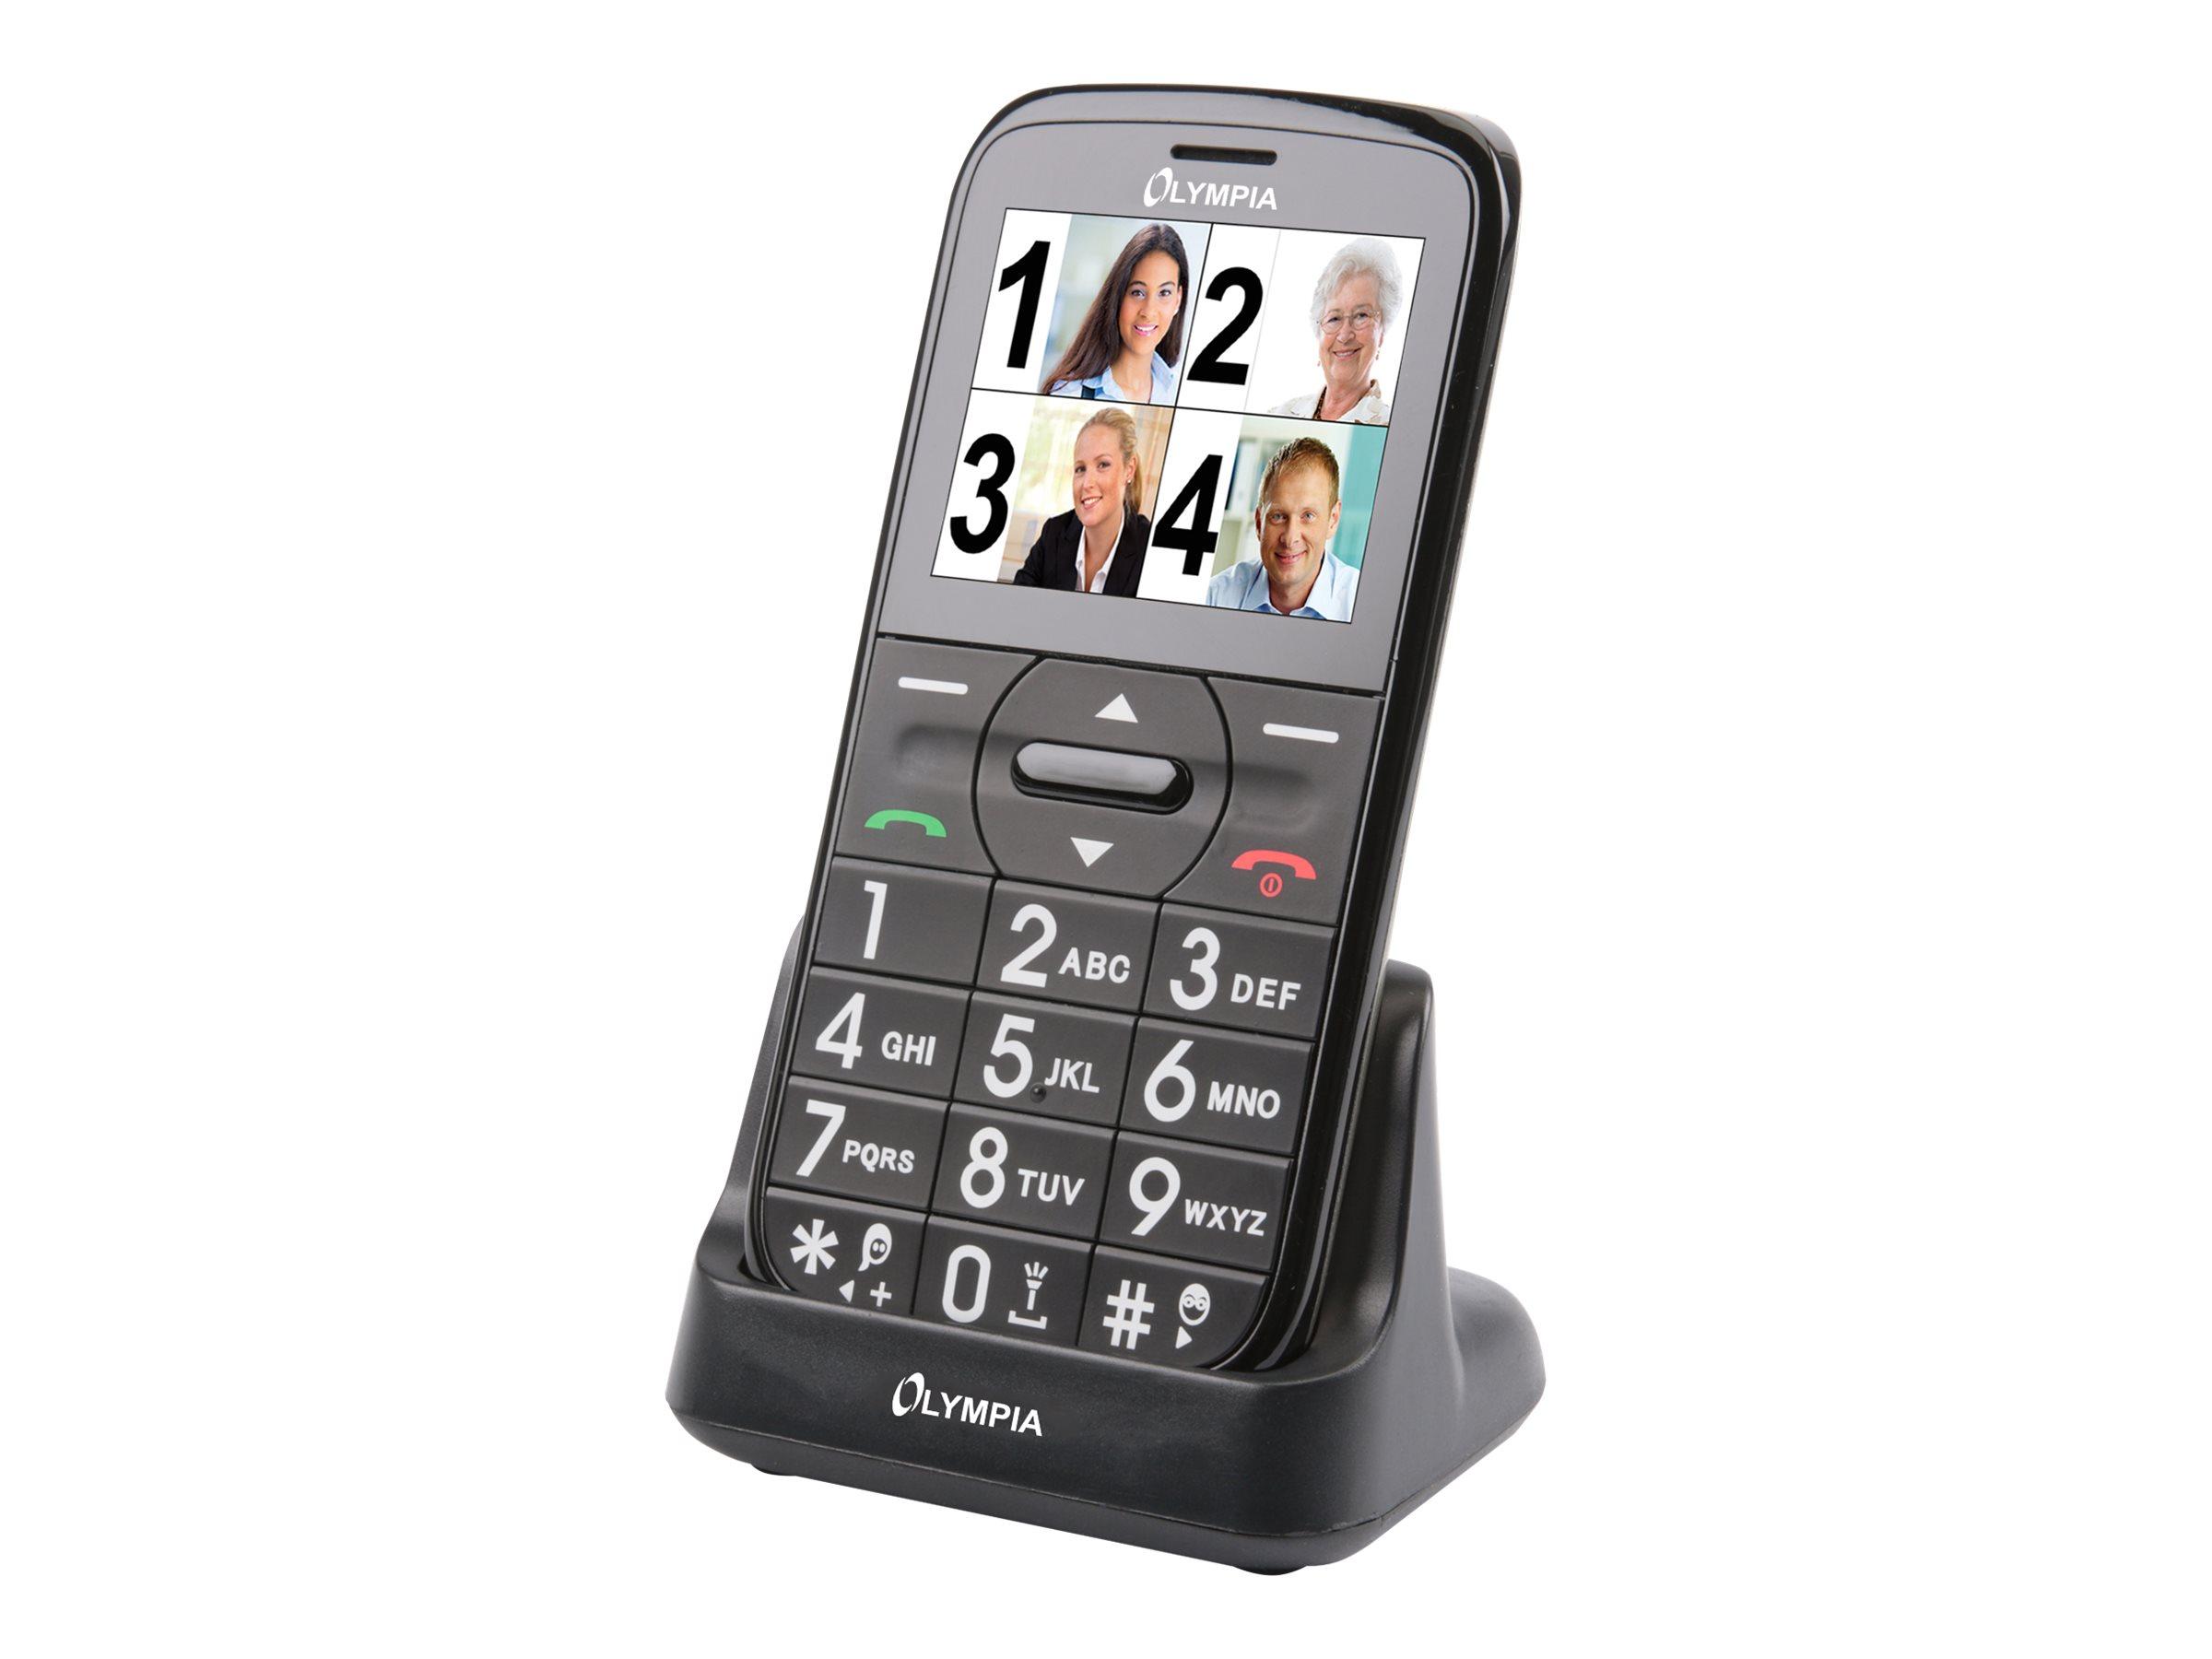 Olympia Happy II - Mobiltelefon - Dual-SIM - microSDHC slot